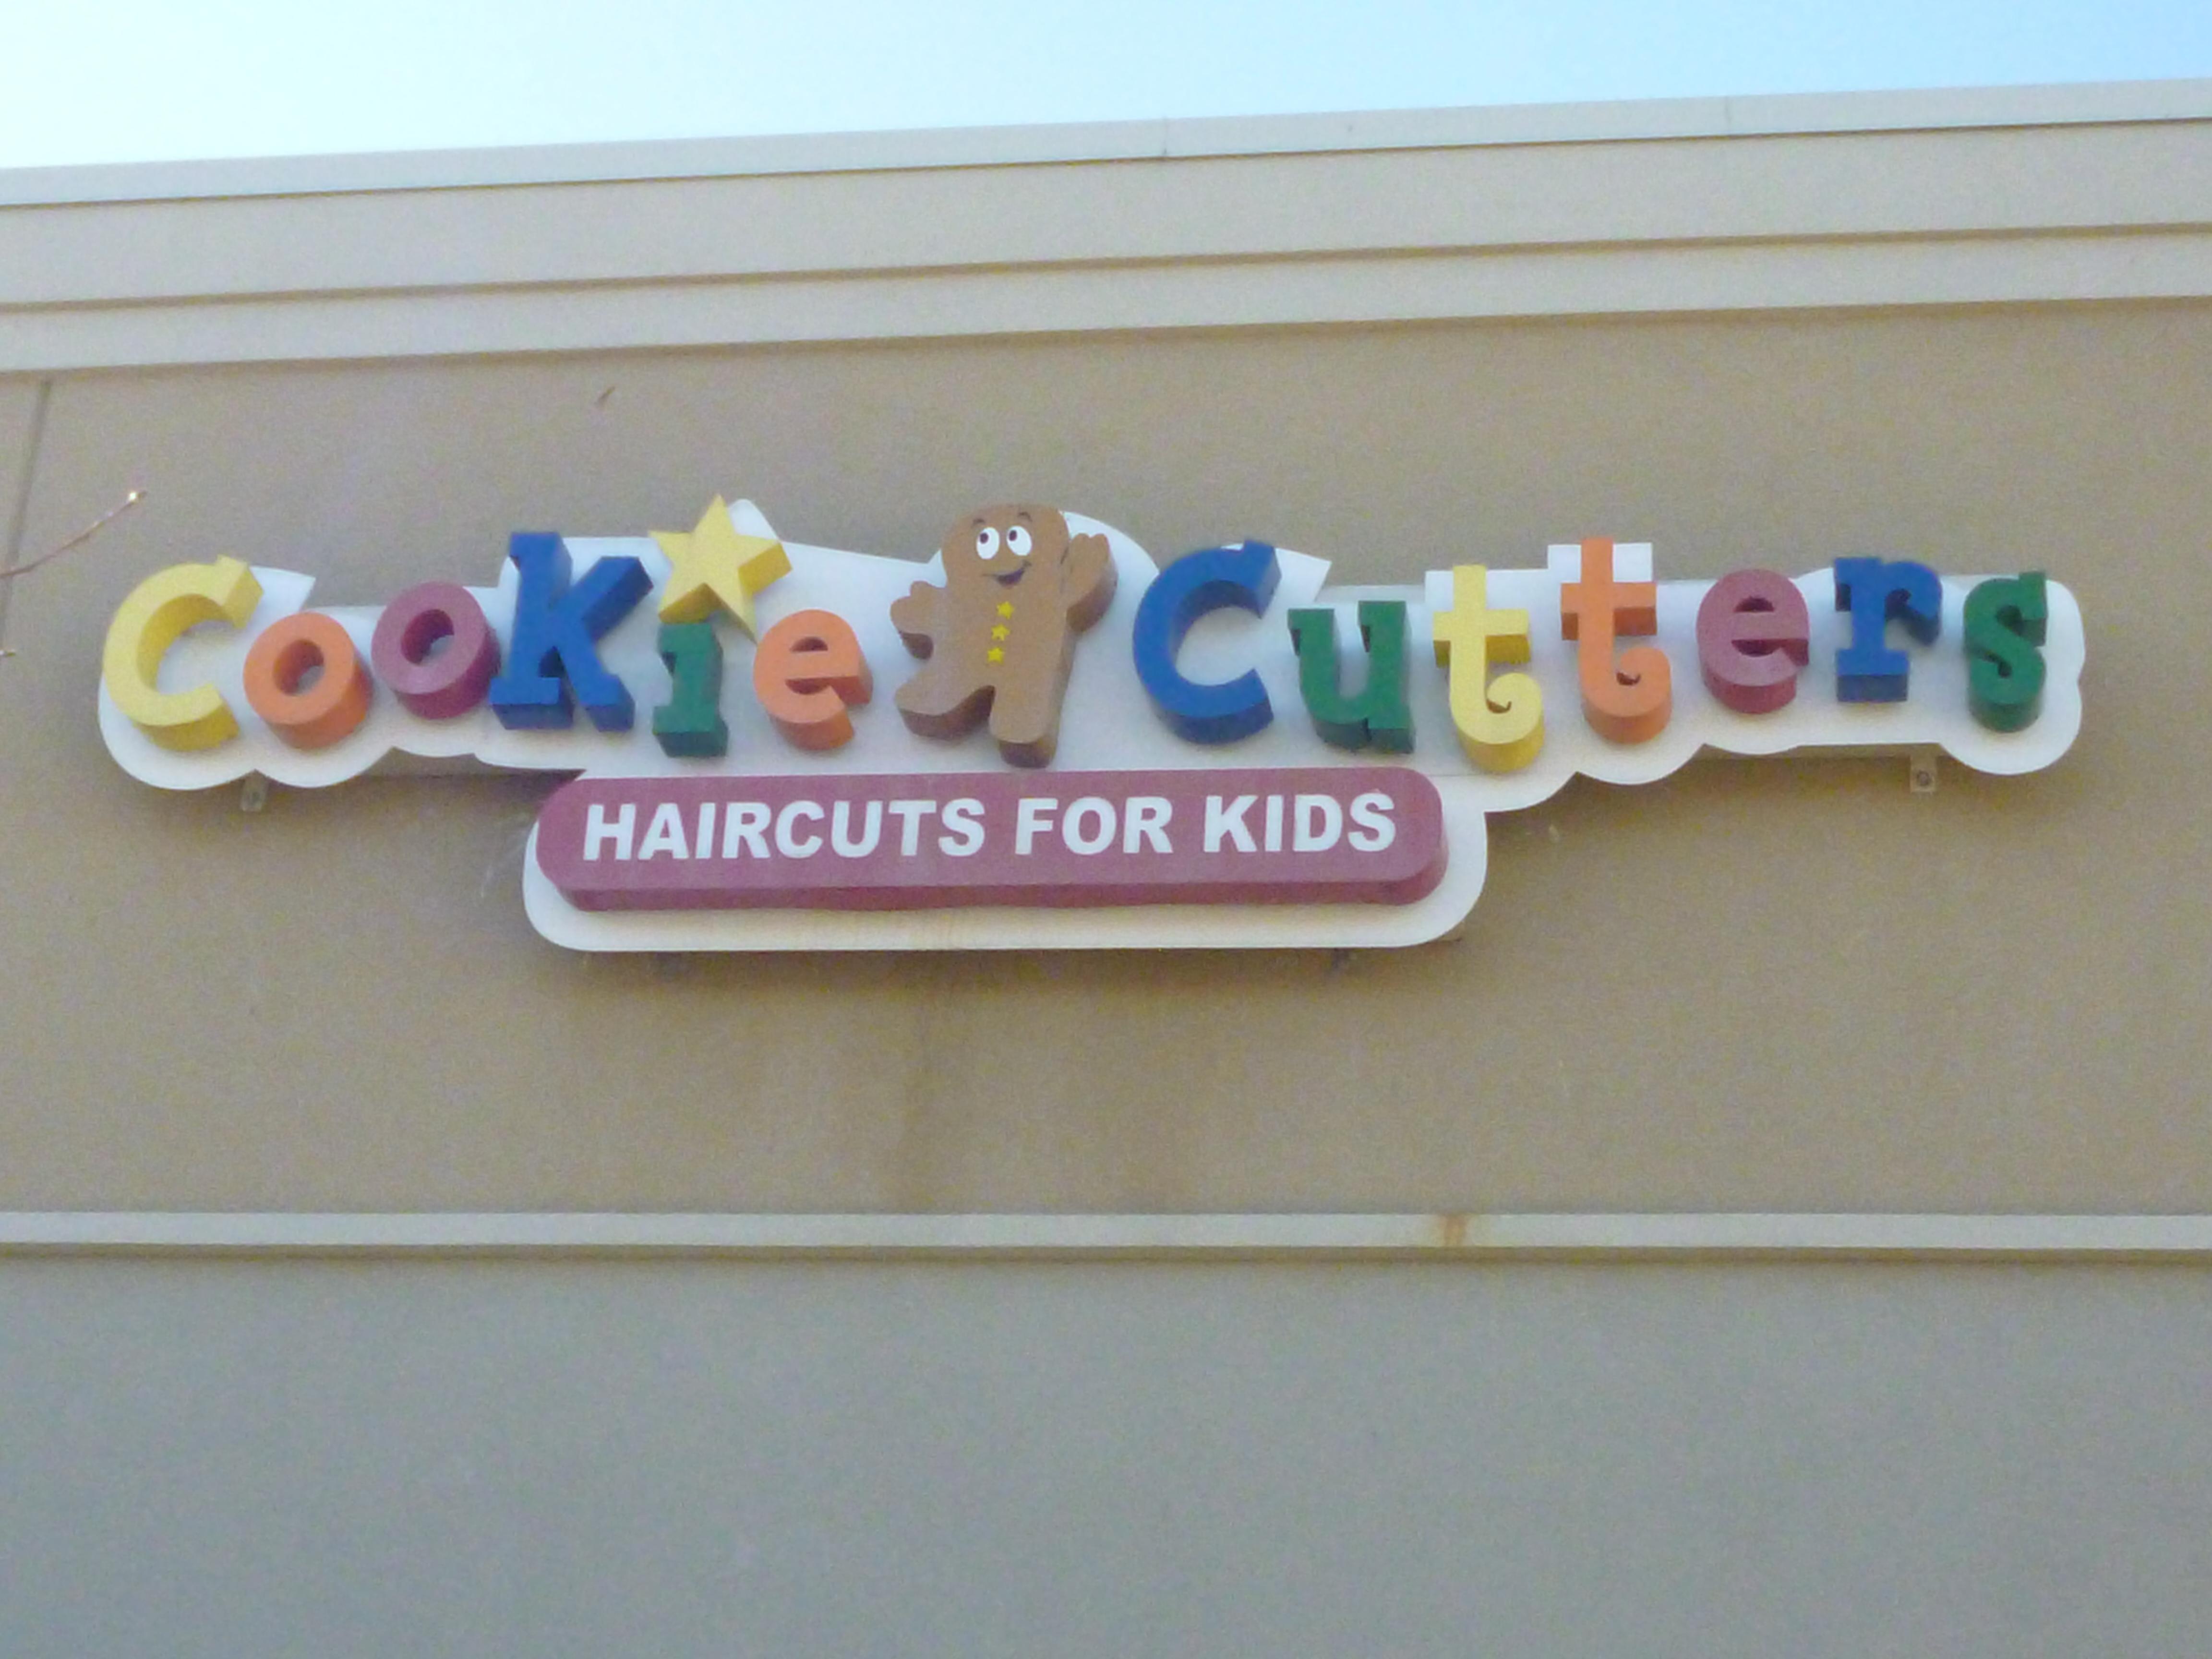 Cookie Cutters Haircuts For Kids Daybreak Utah Daybreak